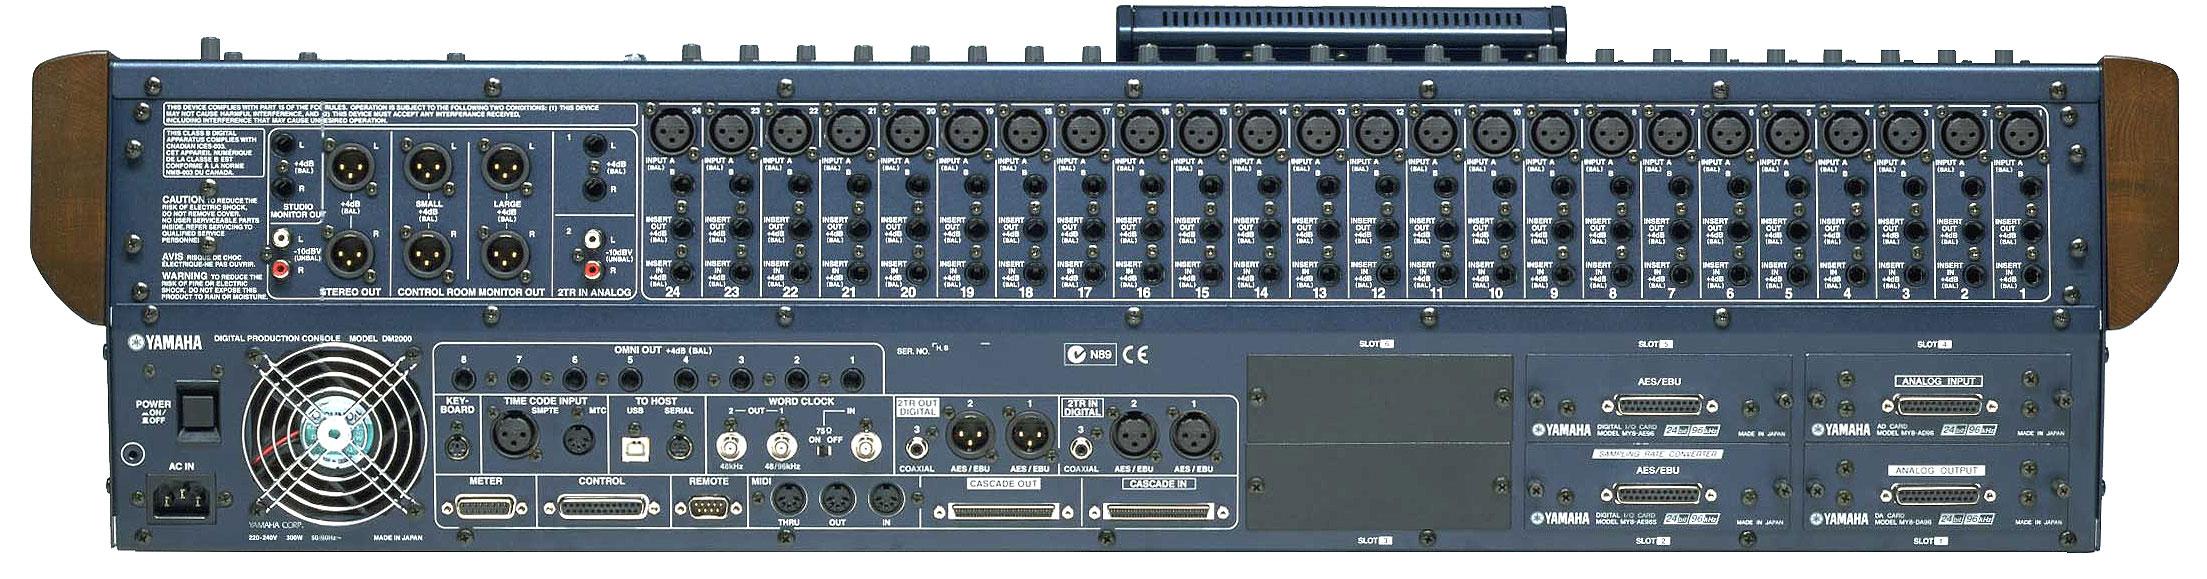 soundcraft efx 8 channel mixer user manual